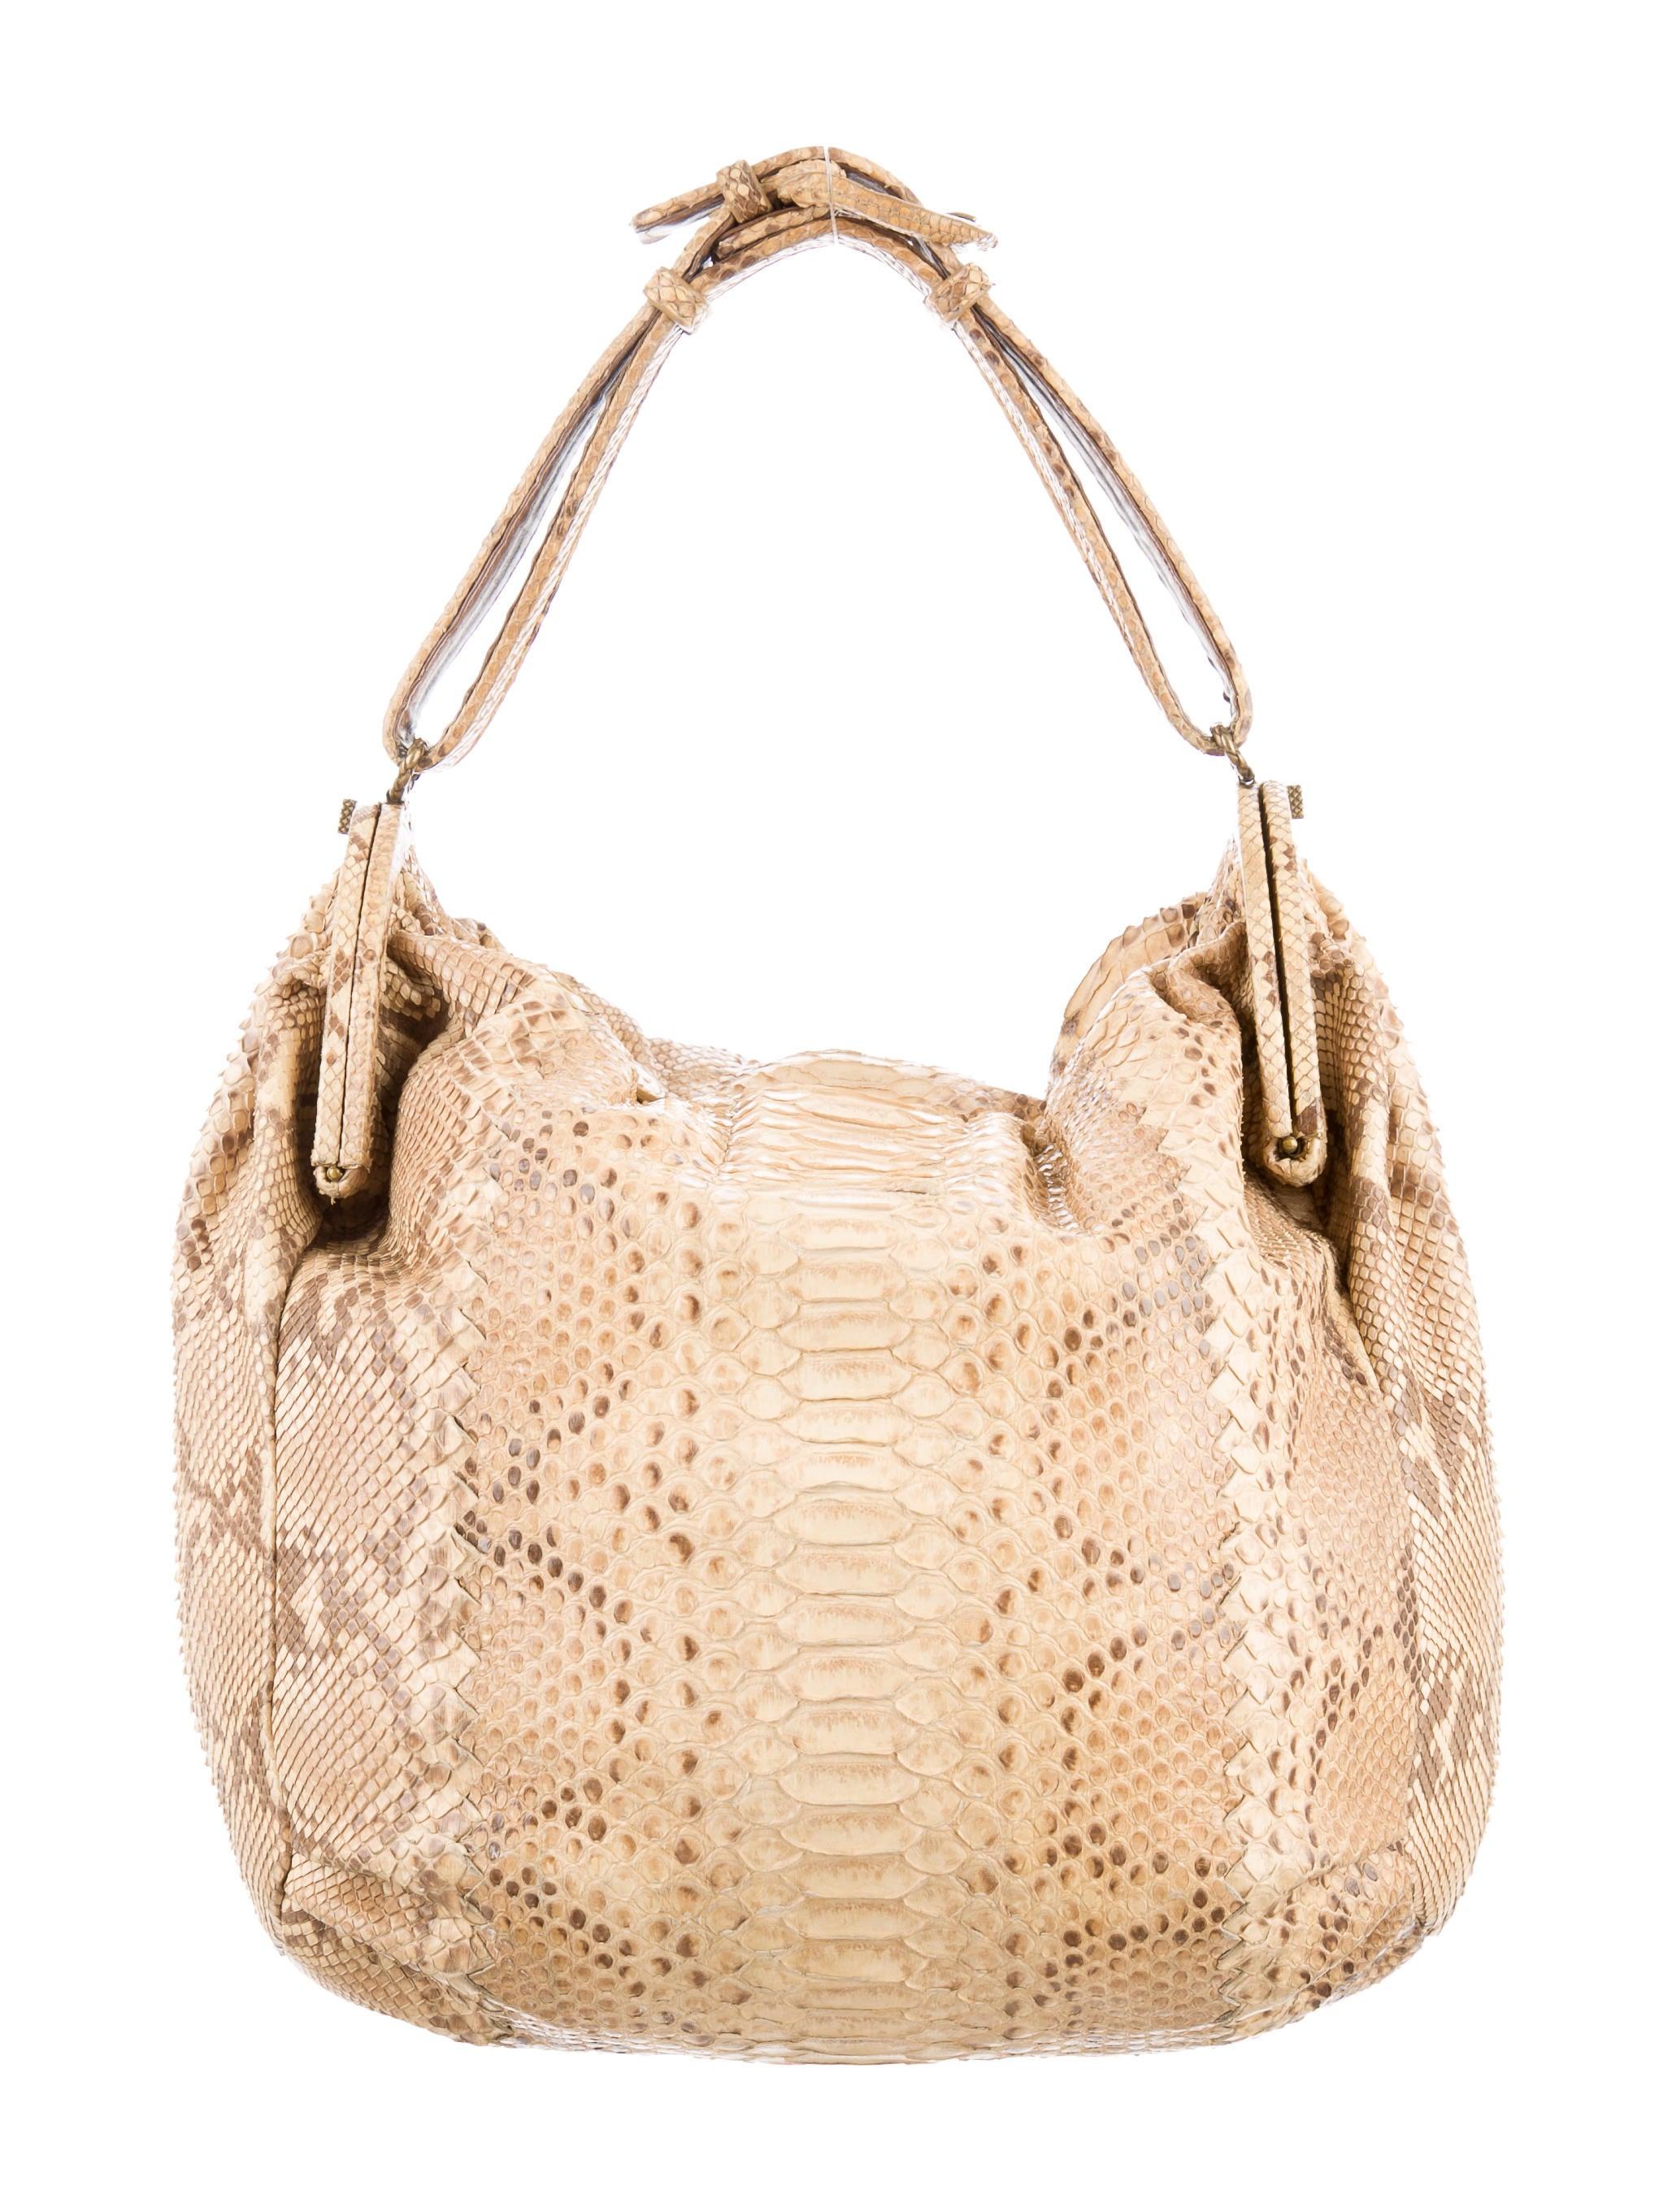 f7f34329897 Bottega Veneta Python Duette Bag - Handbags - BOT41590   The RealReal